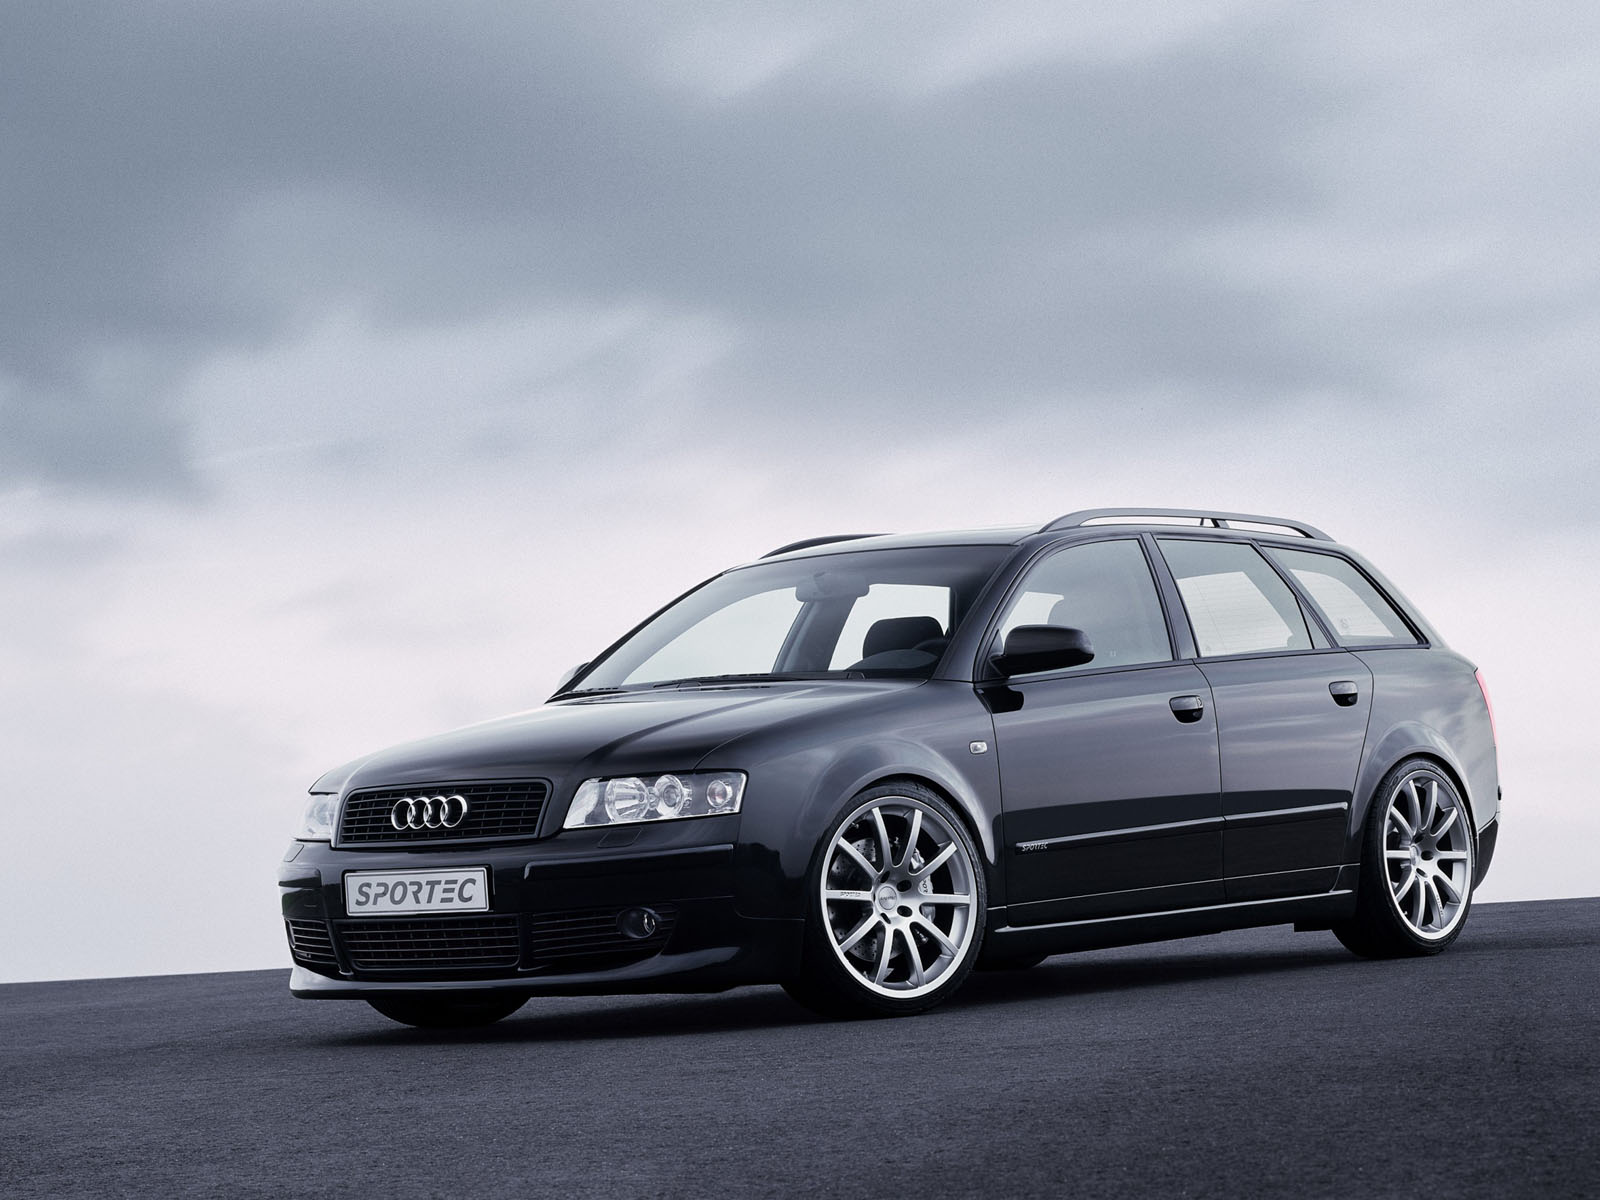 Audi Tt Rs Review Research New Used Audi Tt Rs Models